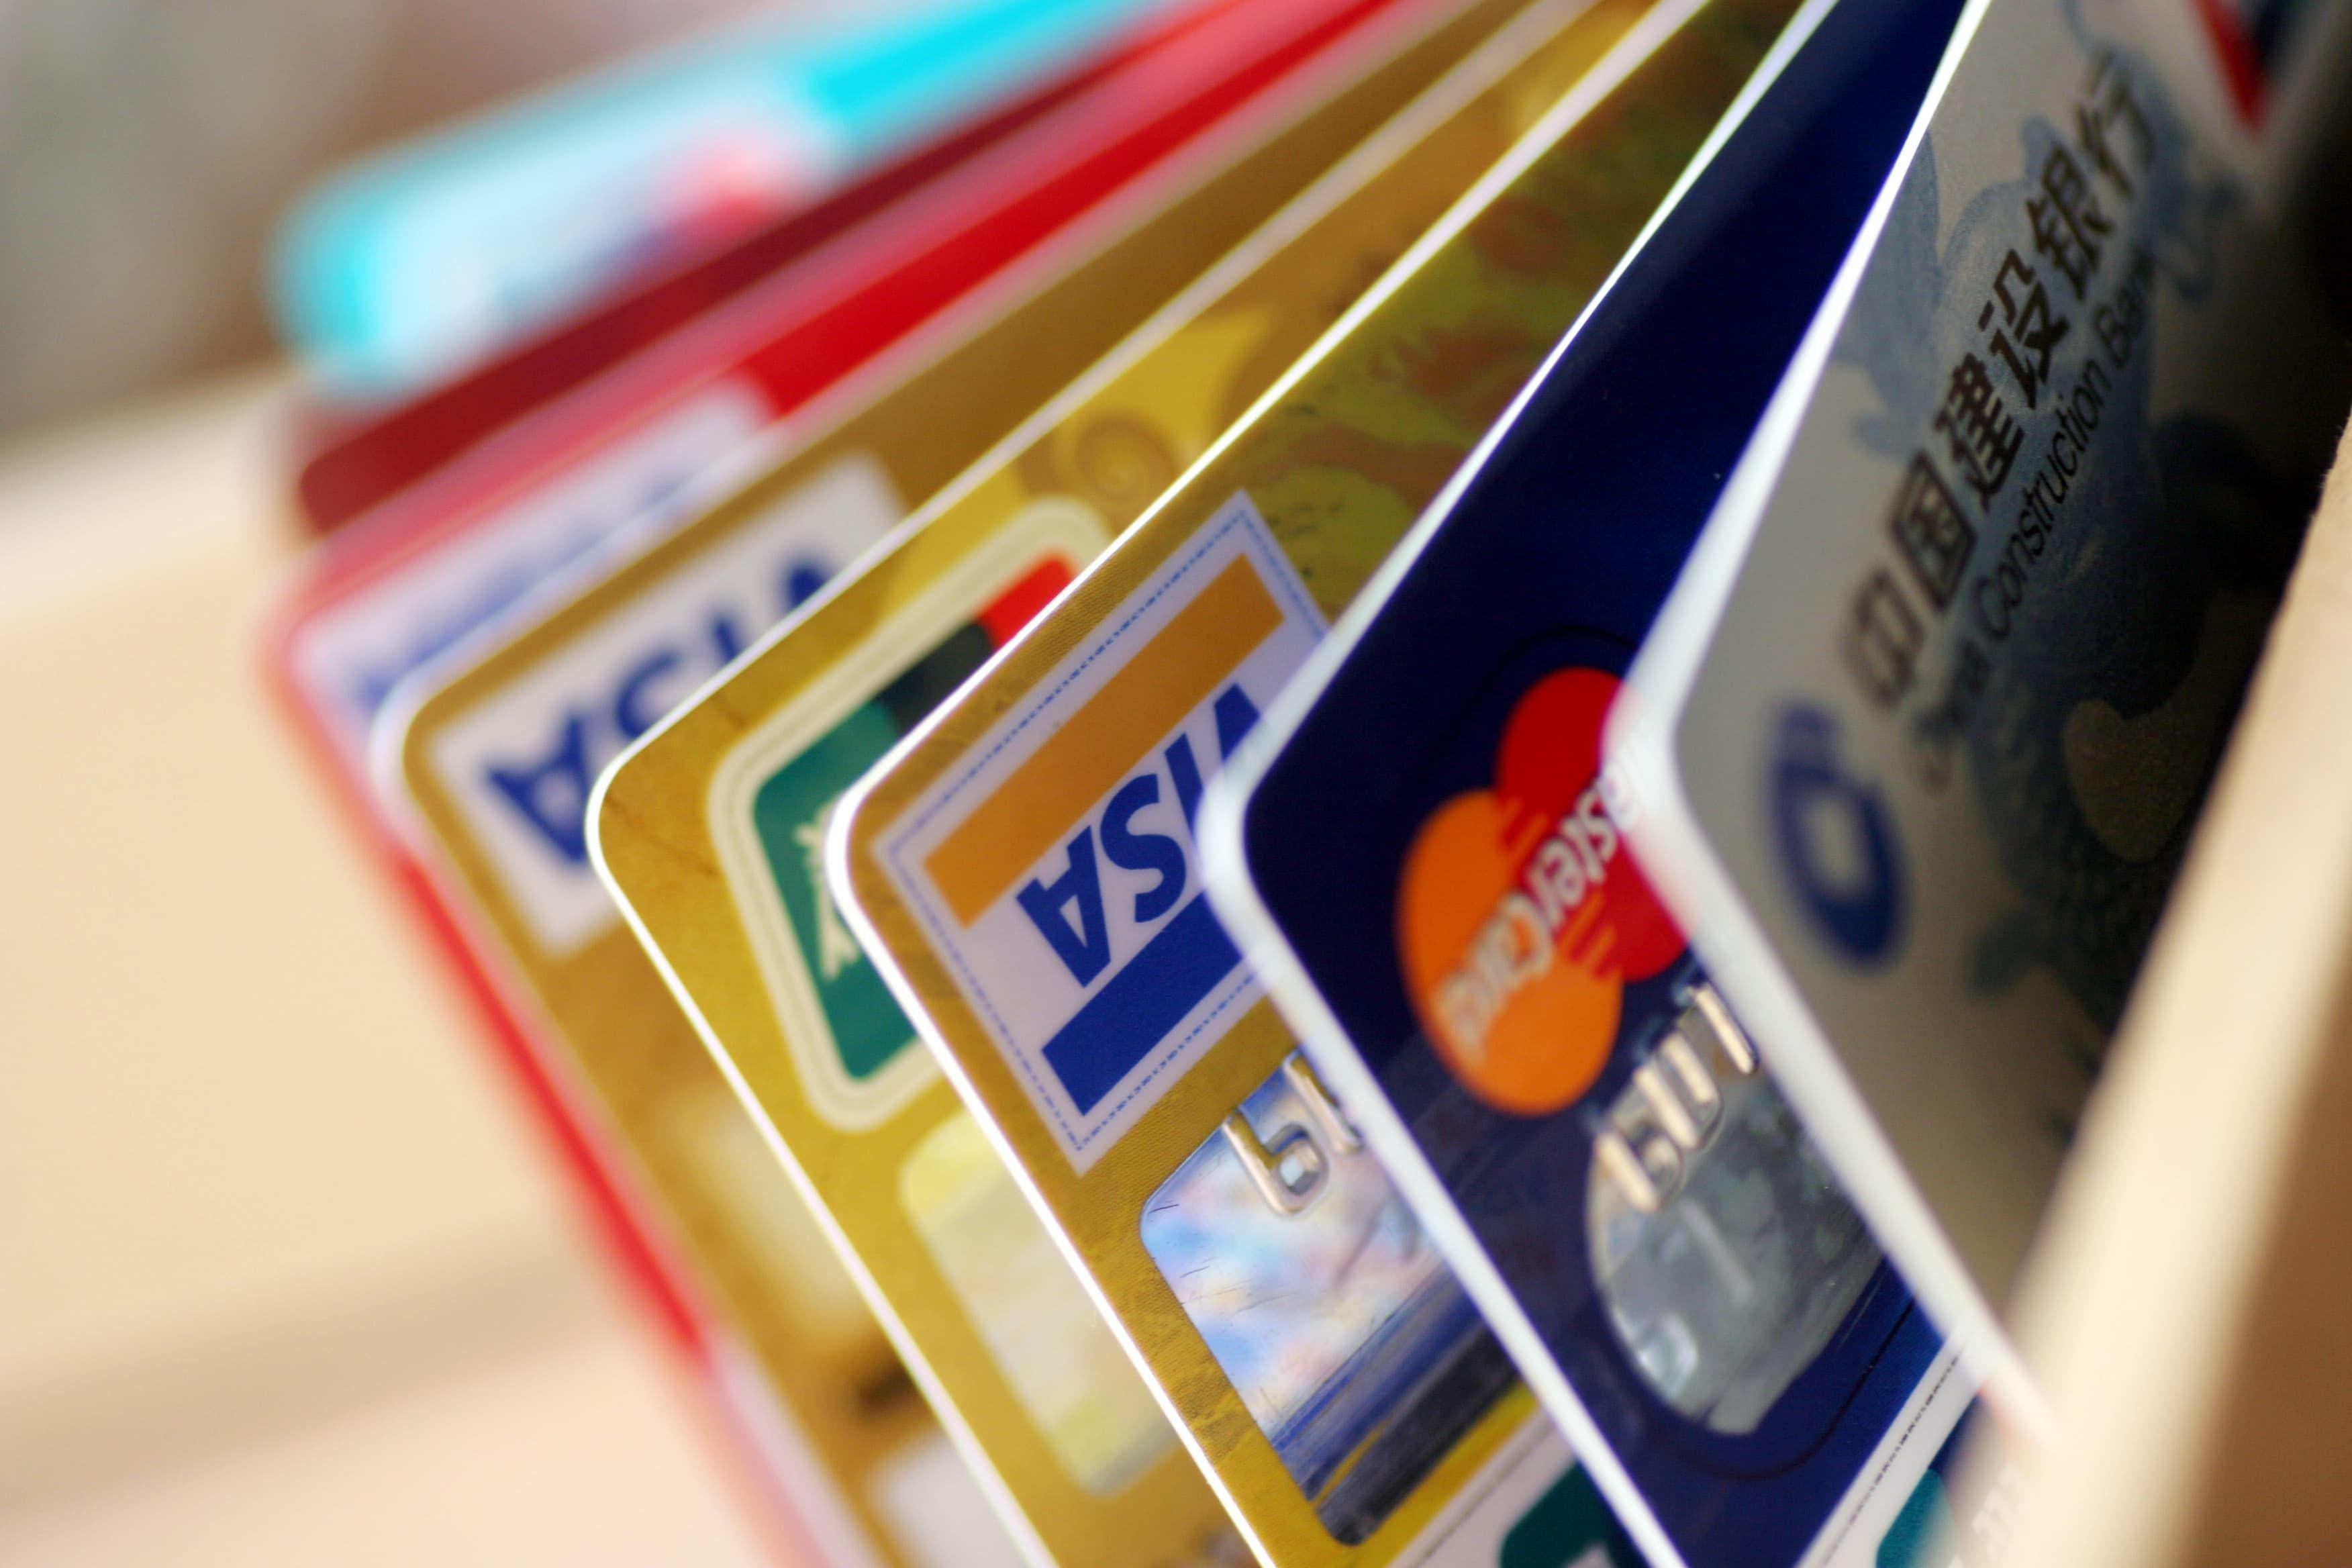 рево плюс заявка на кредит быстрый займ беларусь